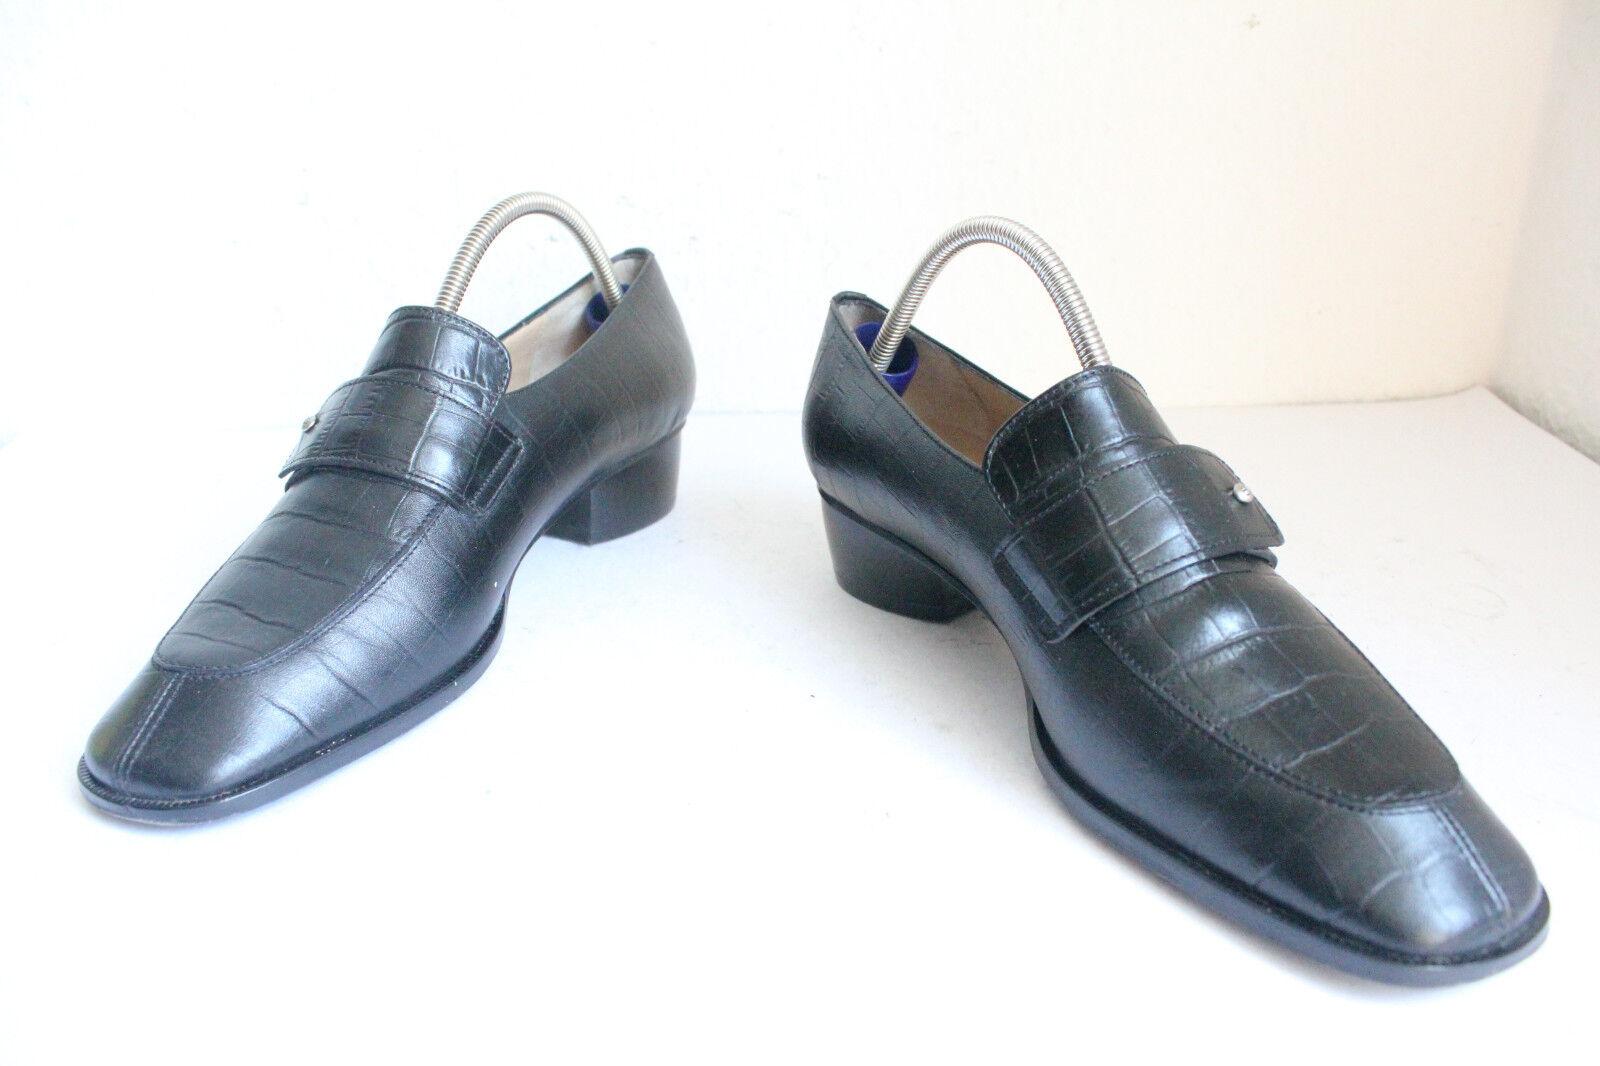 Vintage Agner Slipper Schuhe voll Echtleder Schwarz Eu 38-38,5 made in